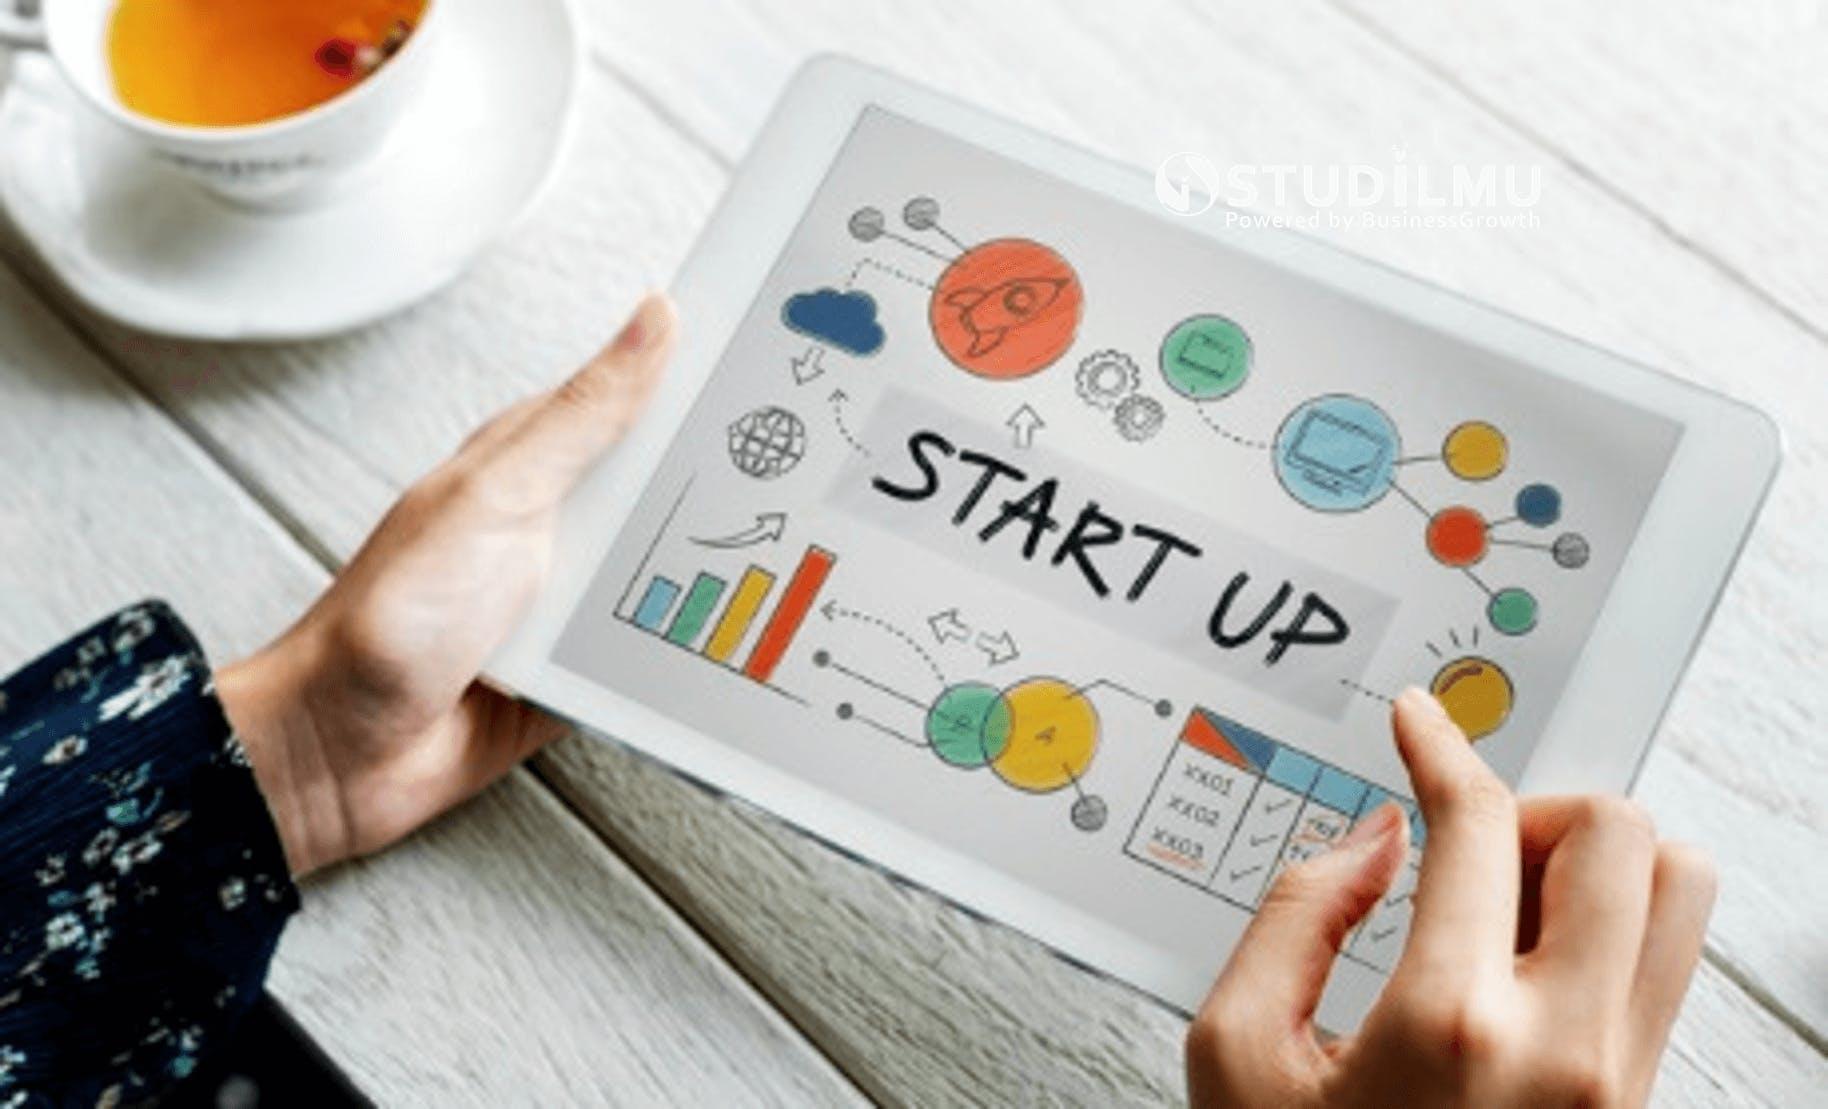 The Tips For Beginner In Building Startup